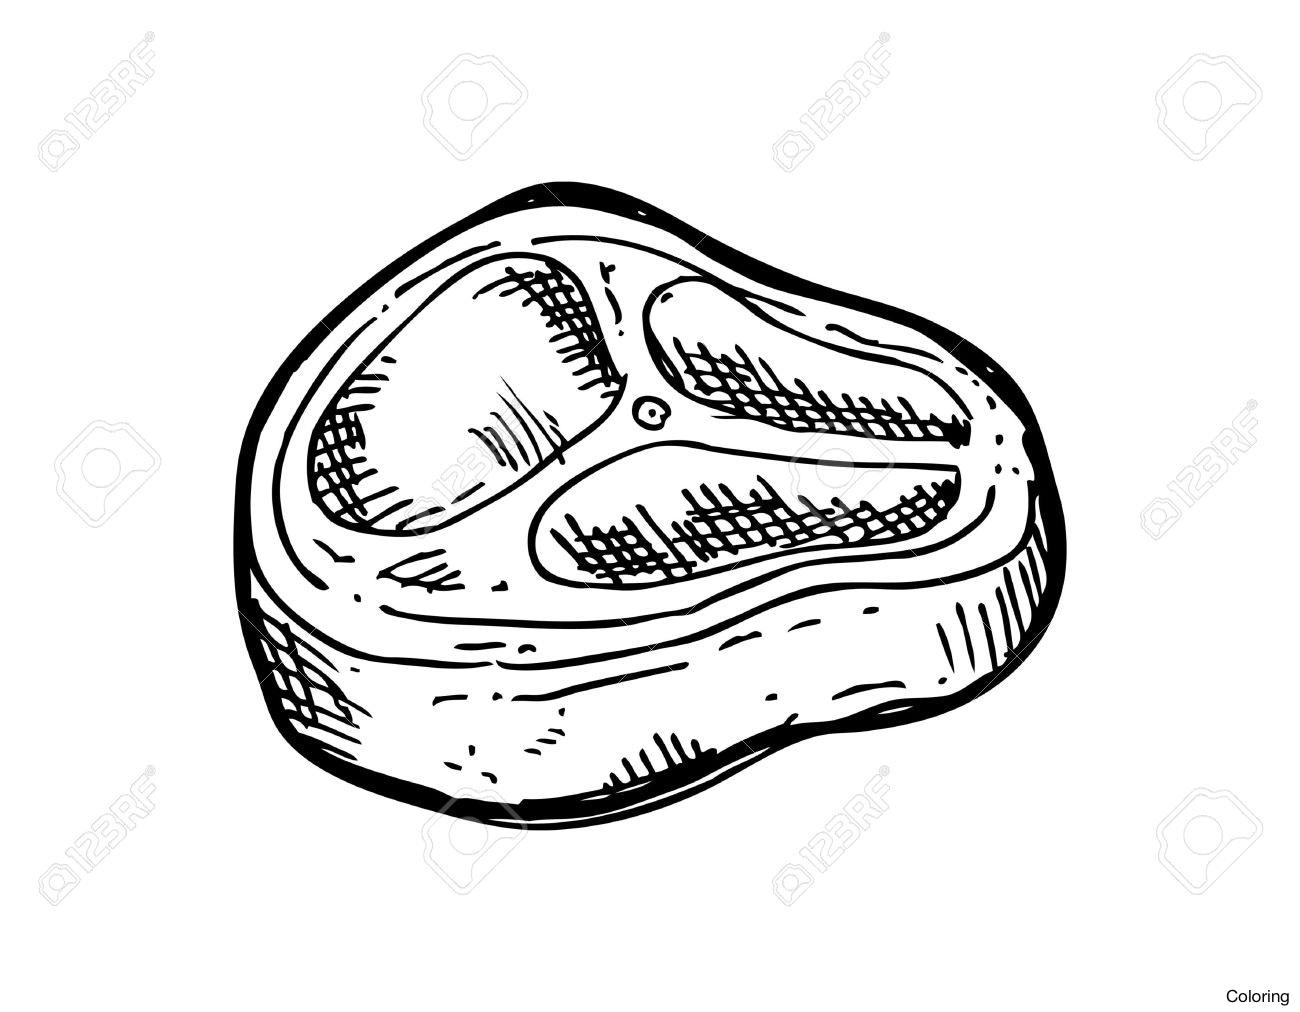 1300x1012 Depositphotos 166527796 Stock Illustration Sliced Beef Steak Hand